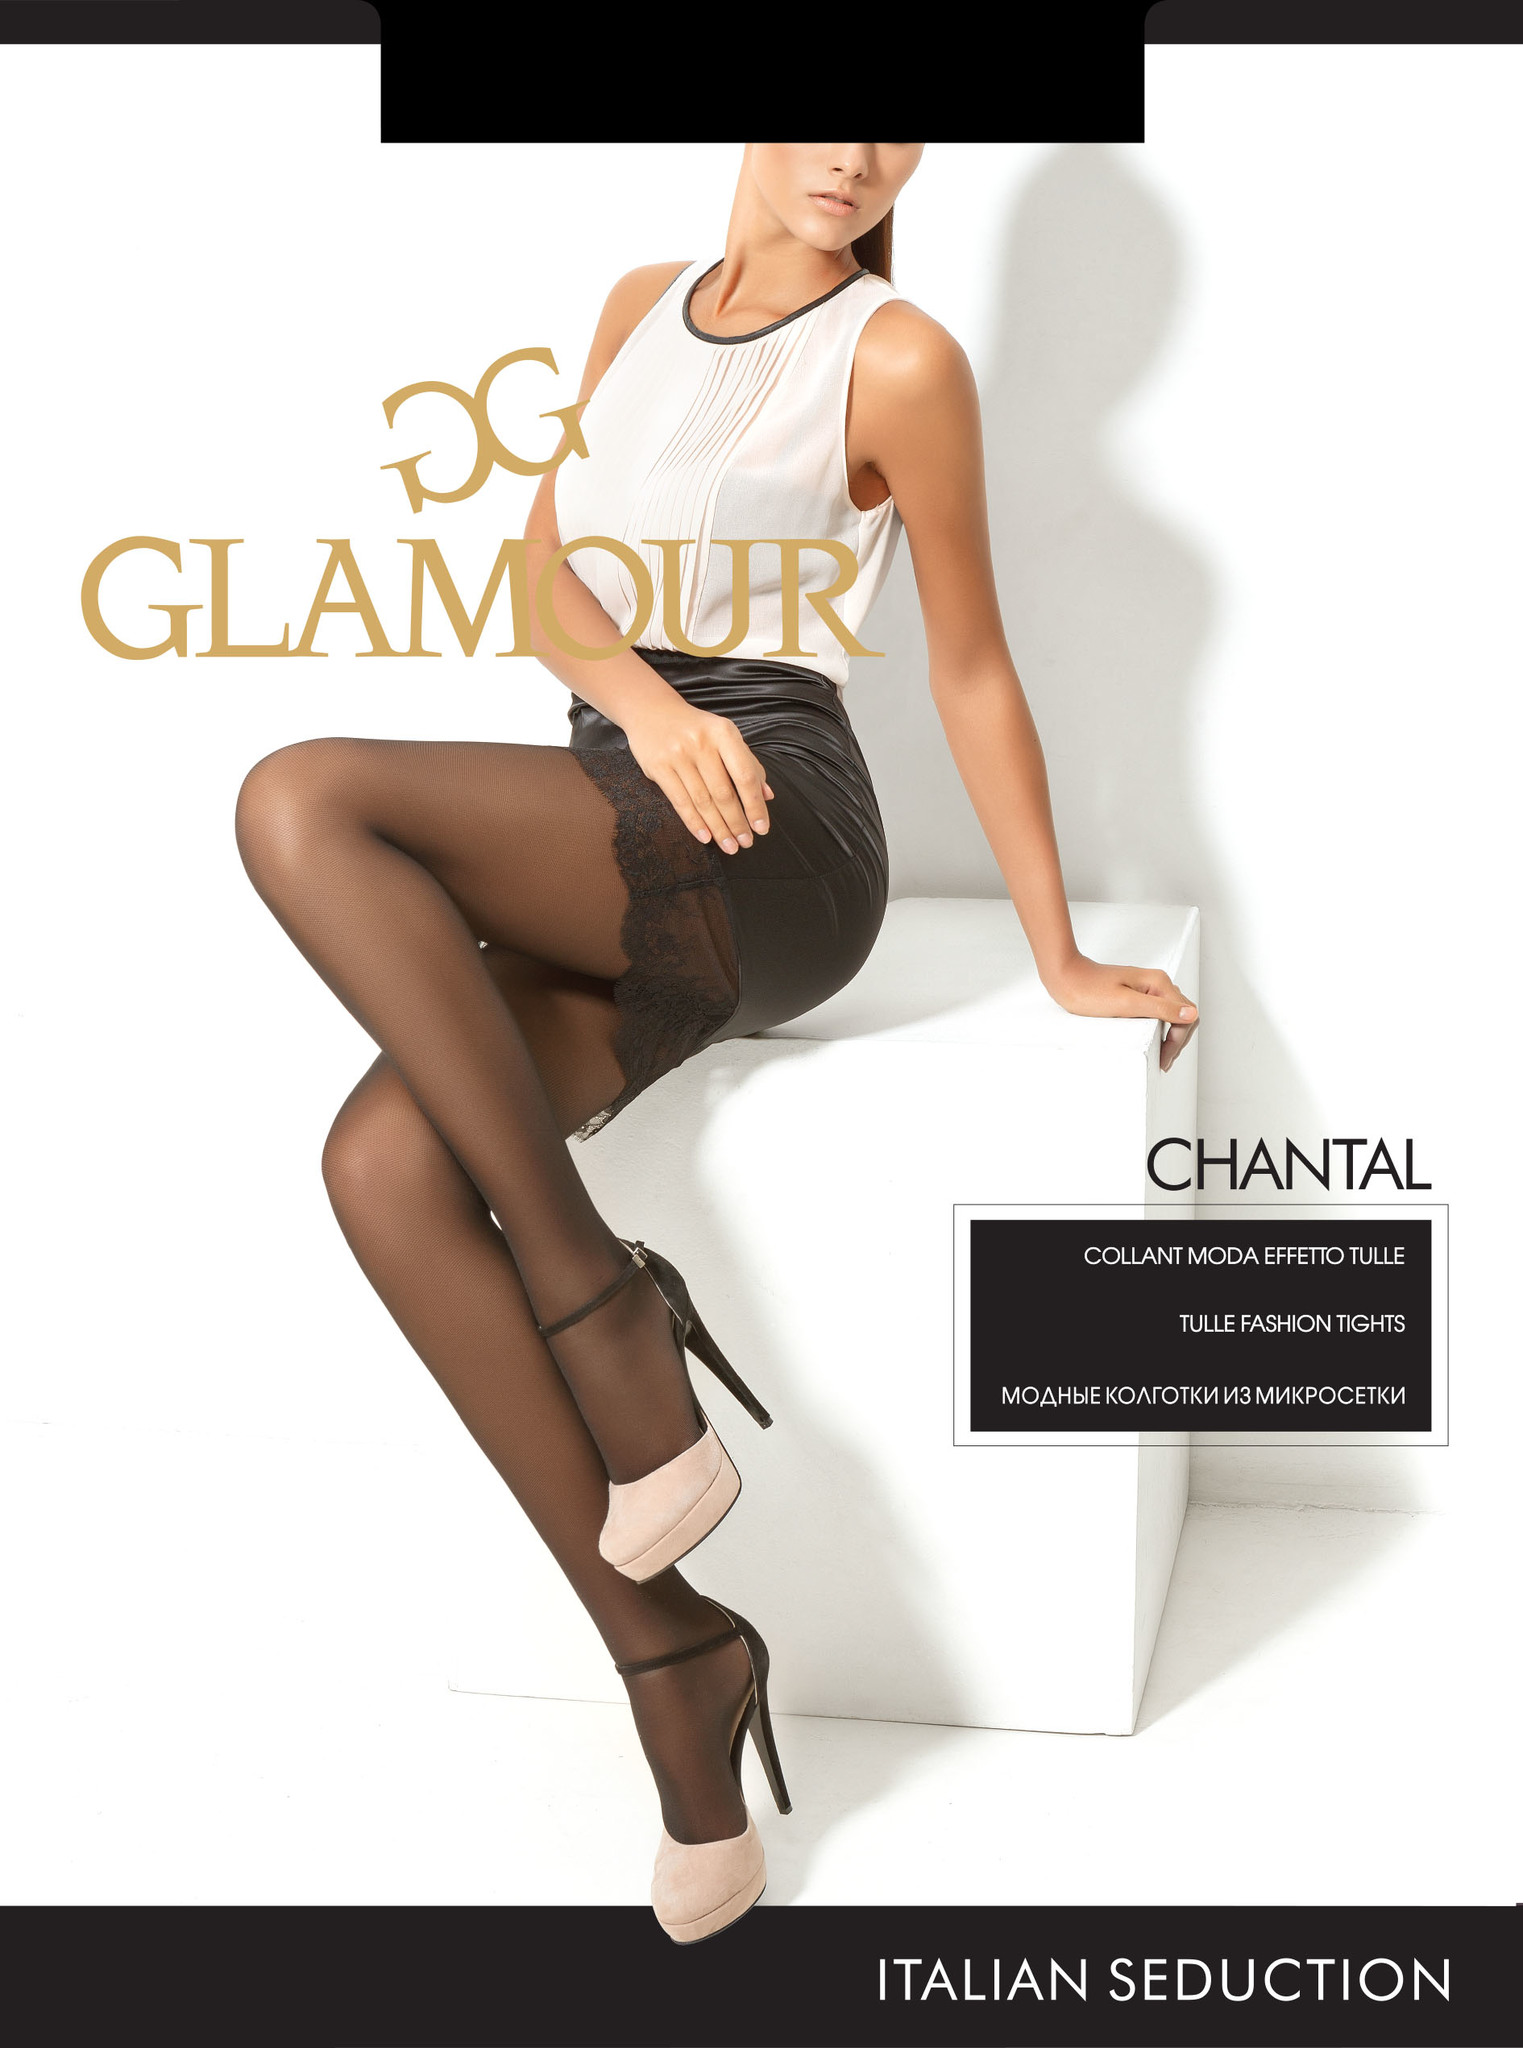 Glamour CHANTAL колготки женские